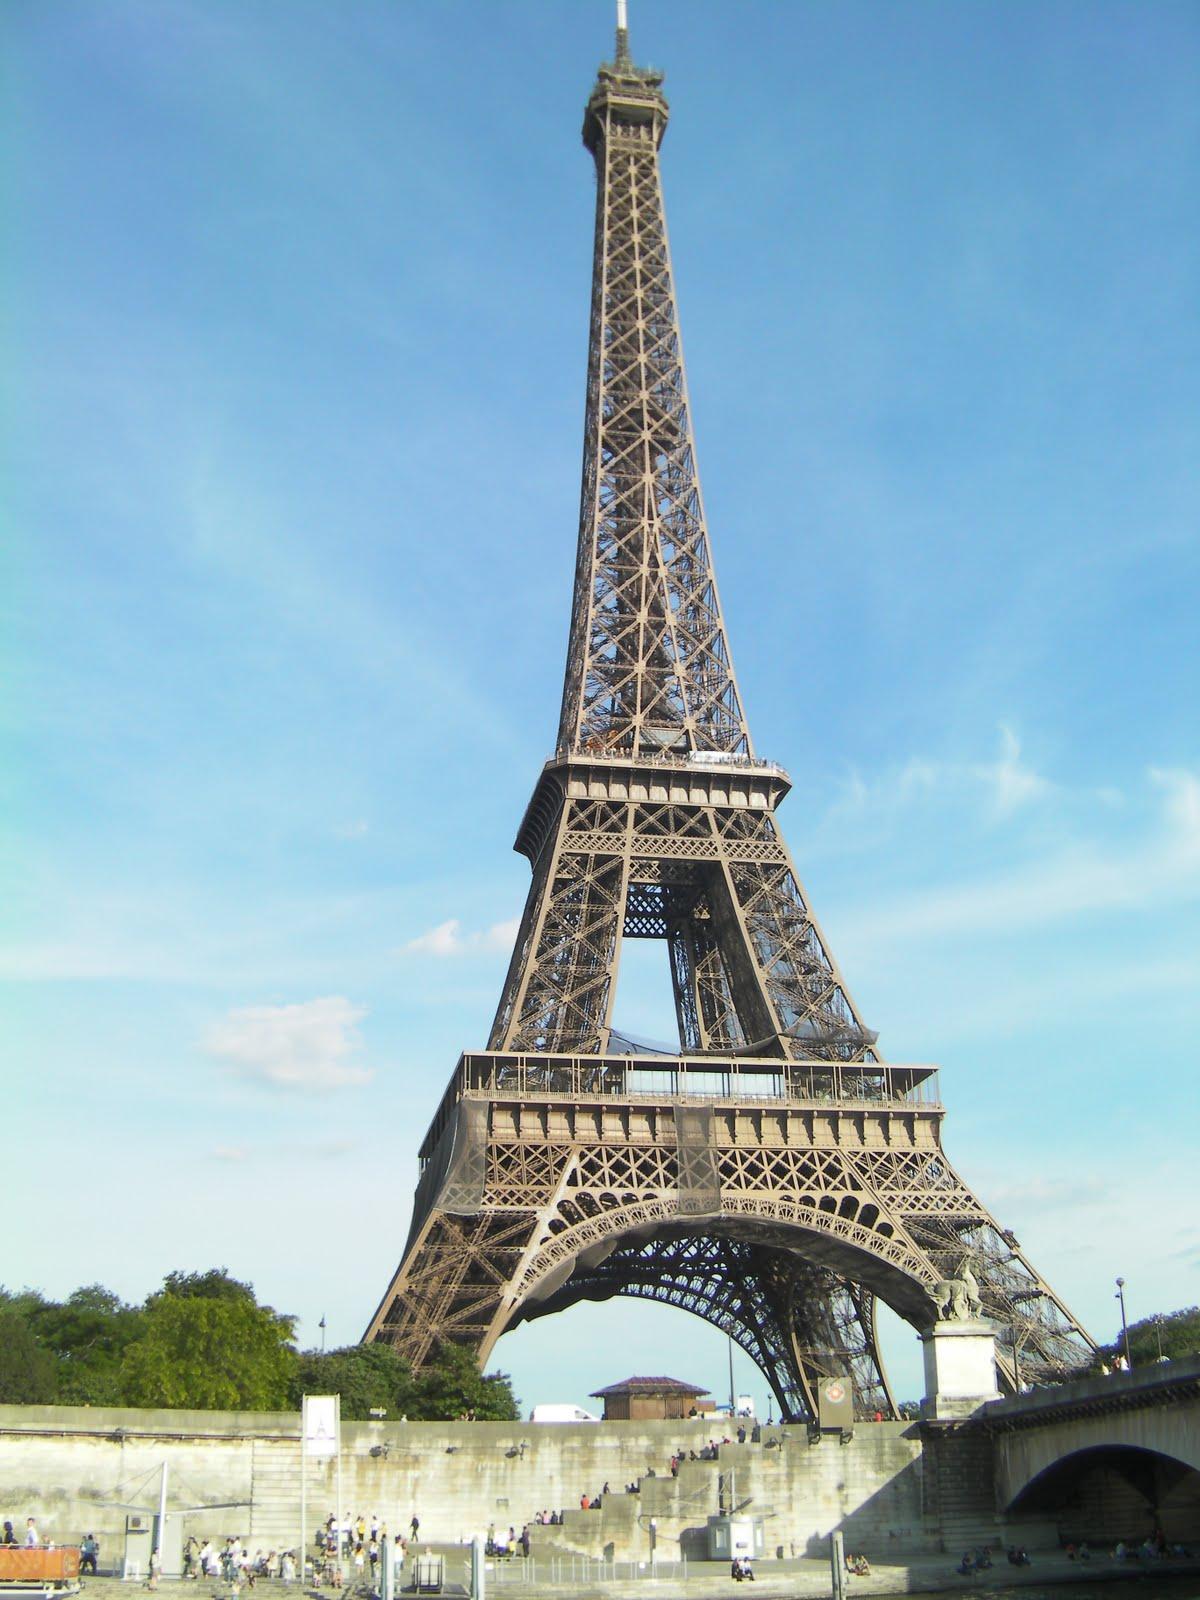 Foto foto terindah menara eiffel paris musik gambar menara eiffel di prancis foto menara eiffel thecheapjerseys Images